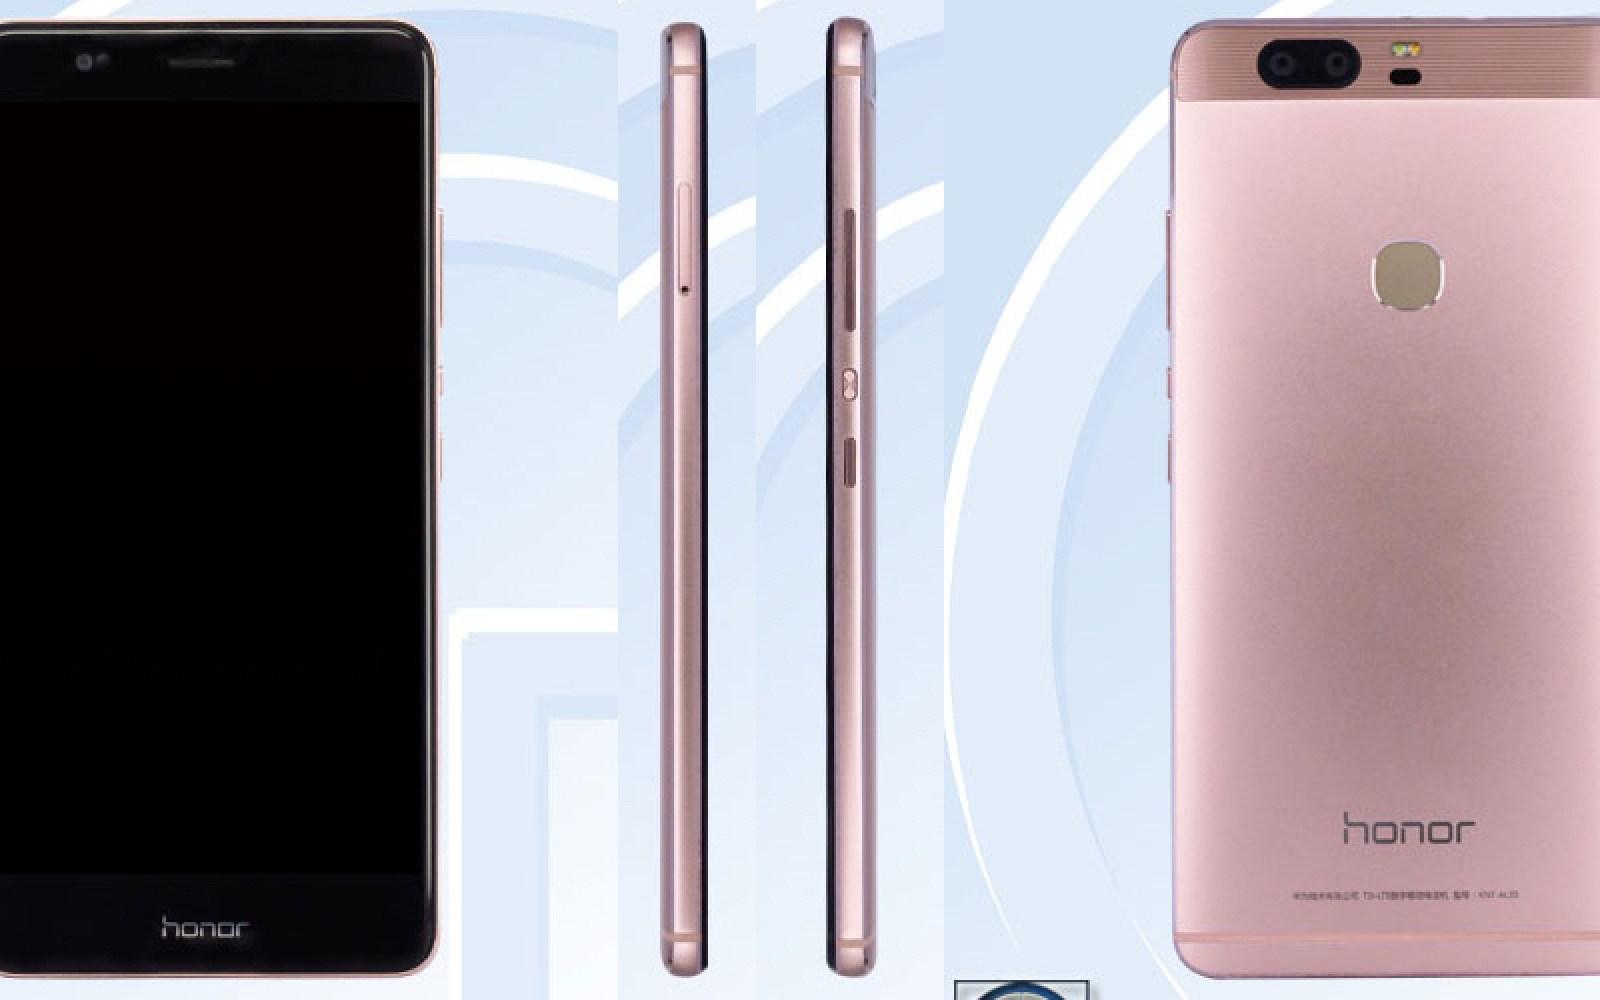 Honor V8 leaks on TENAA, features dual-camera setup, 4GB RAM, QHD screen, 3400mAh battery and pink metal finish